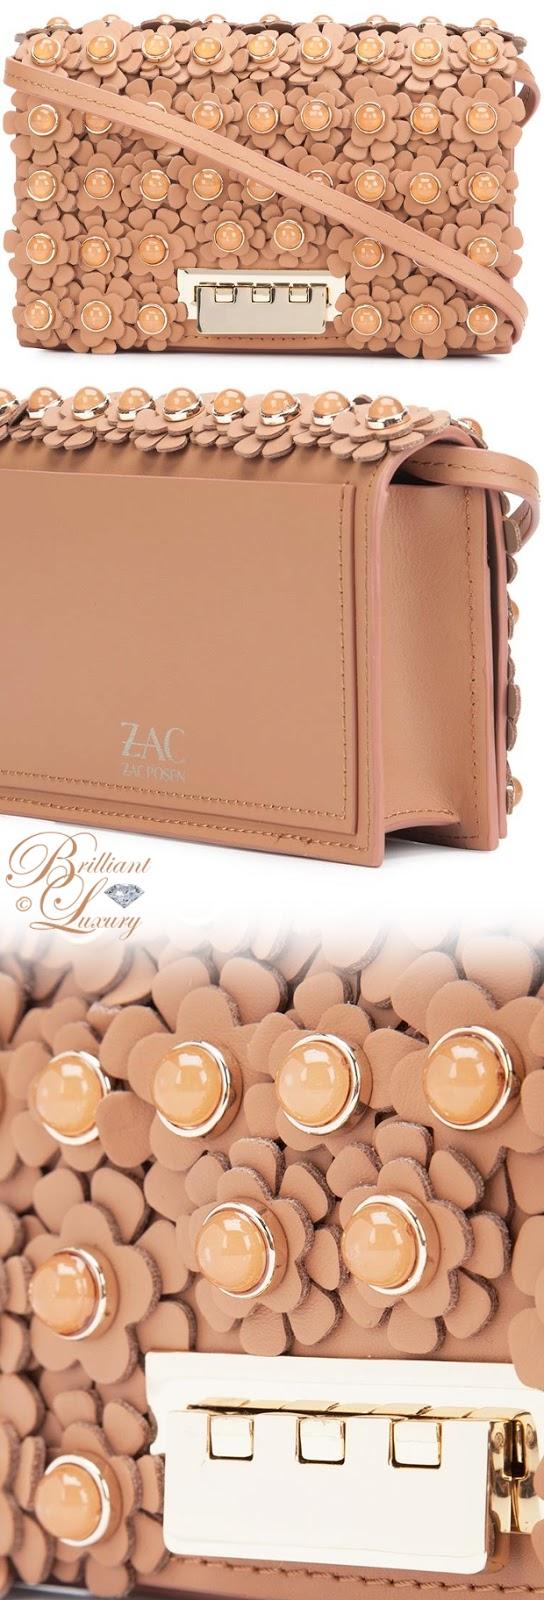 Brilliant Luxury ♦ Zac Zac Posen Flower Embellished Crossbody Bag